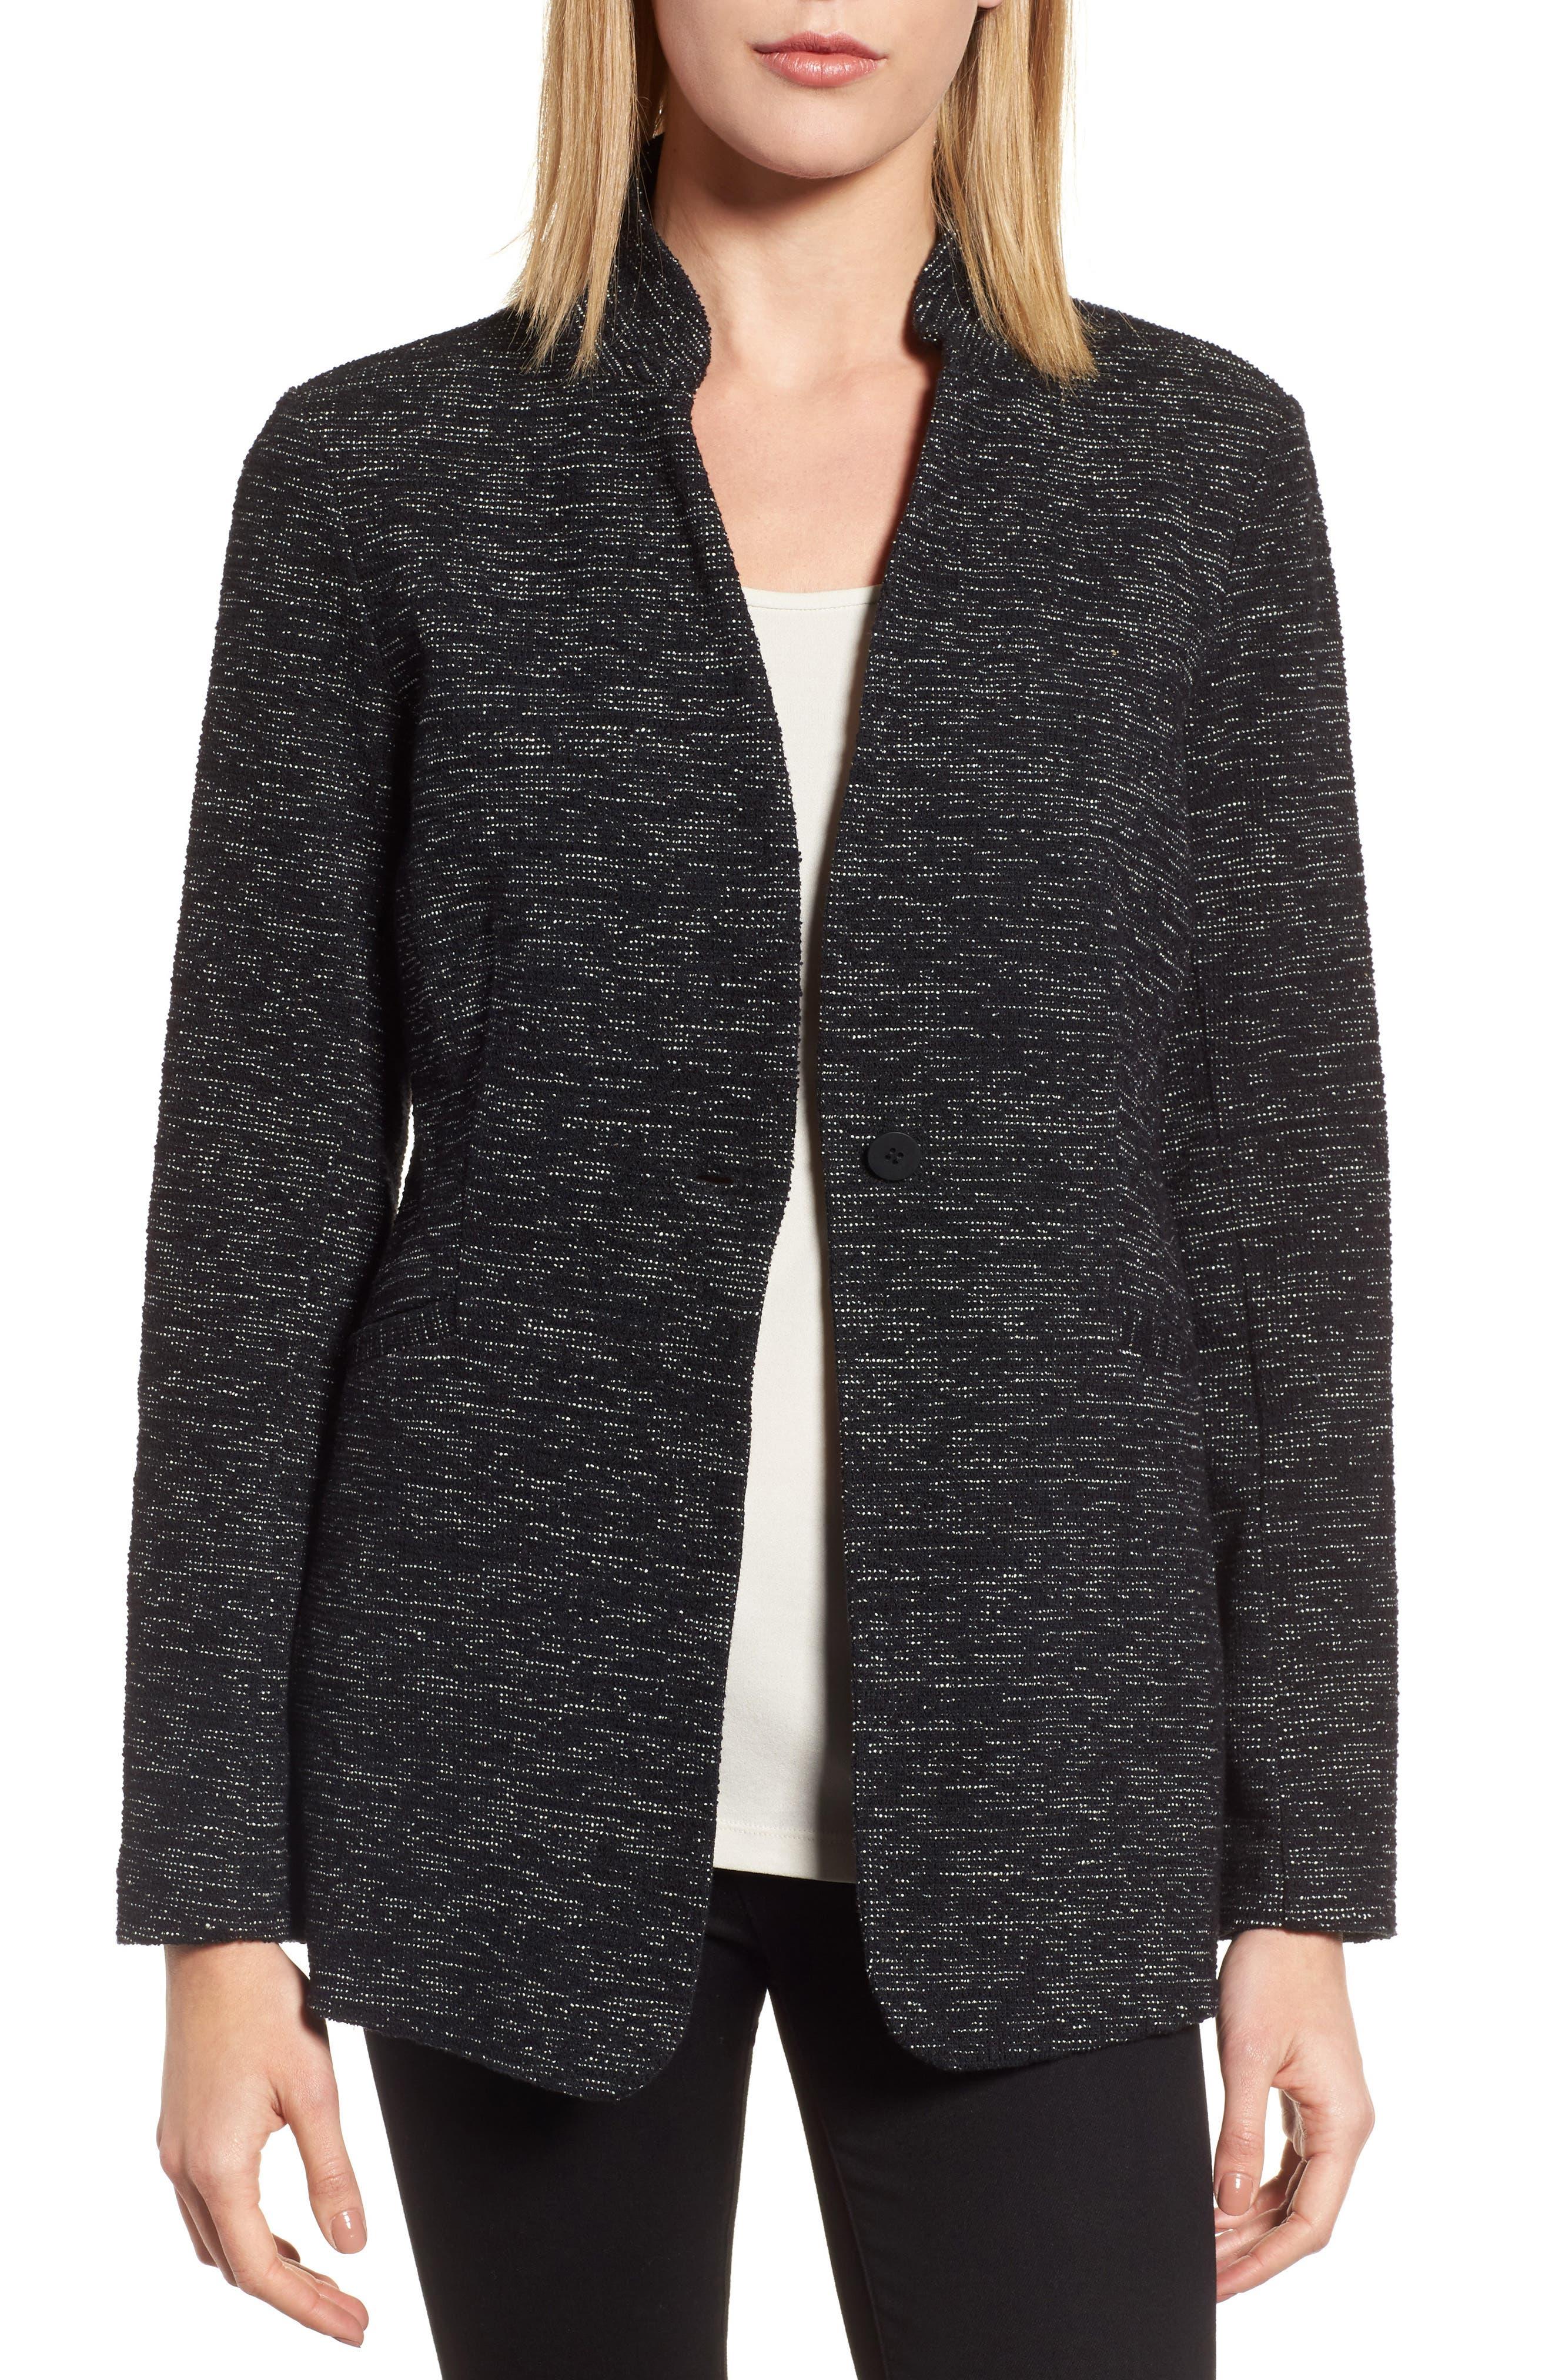 Organic Cotton Blend Tweed Jacket,                         Main,                         color, Black